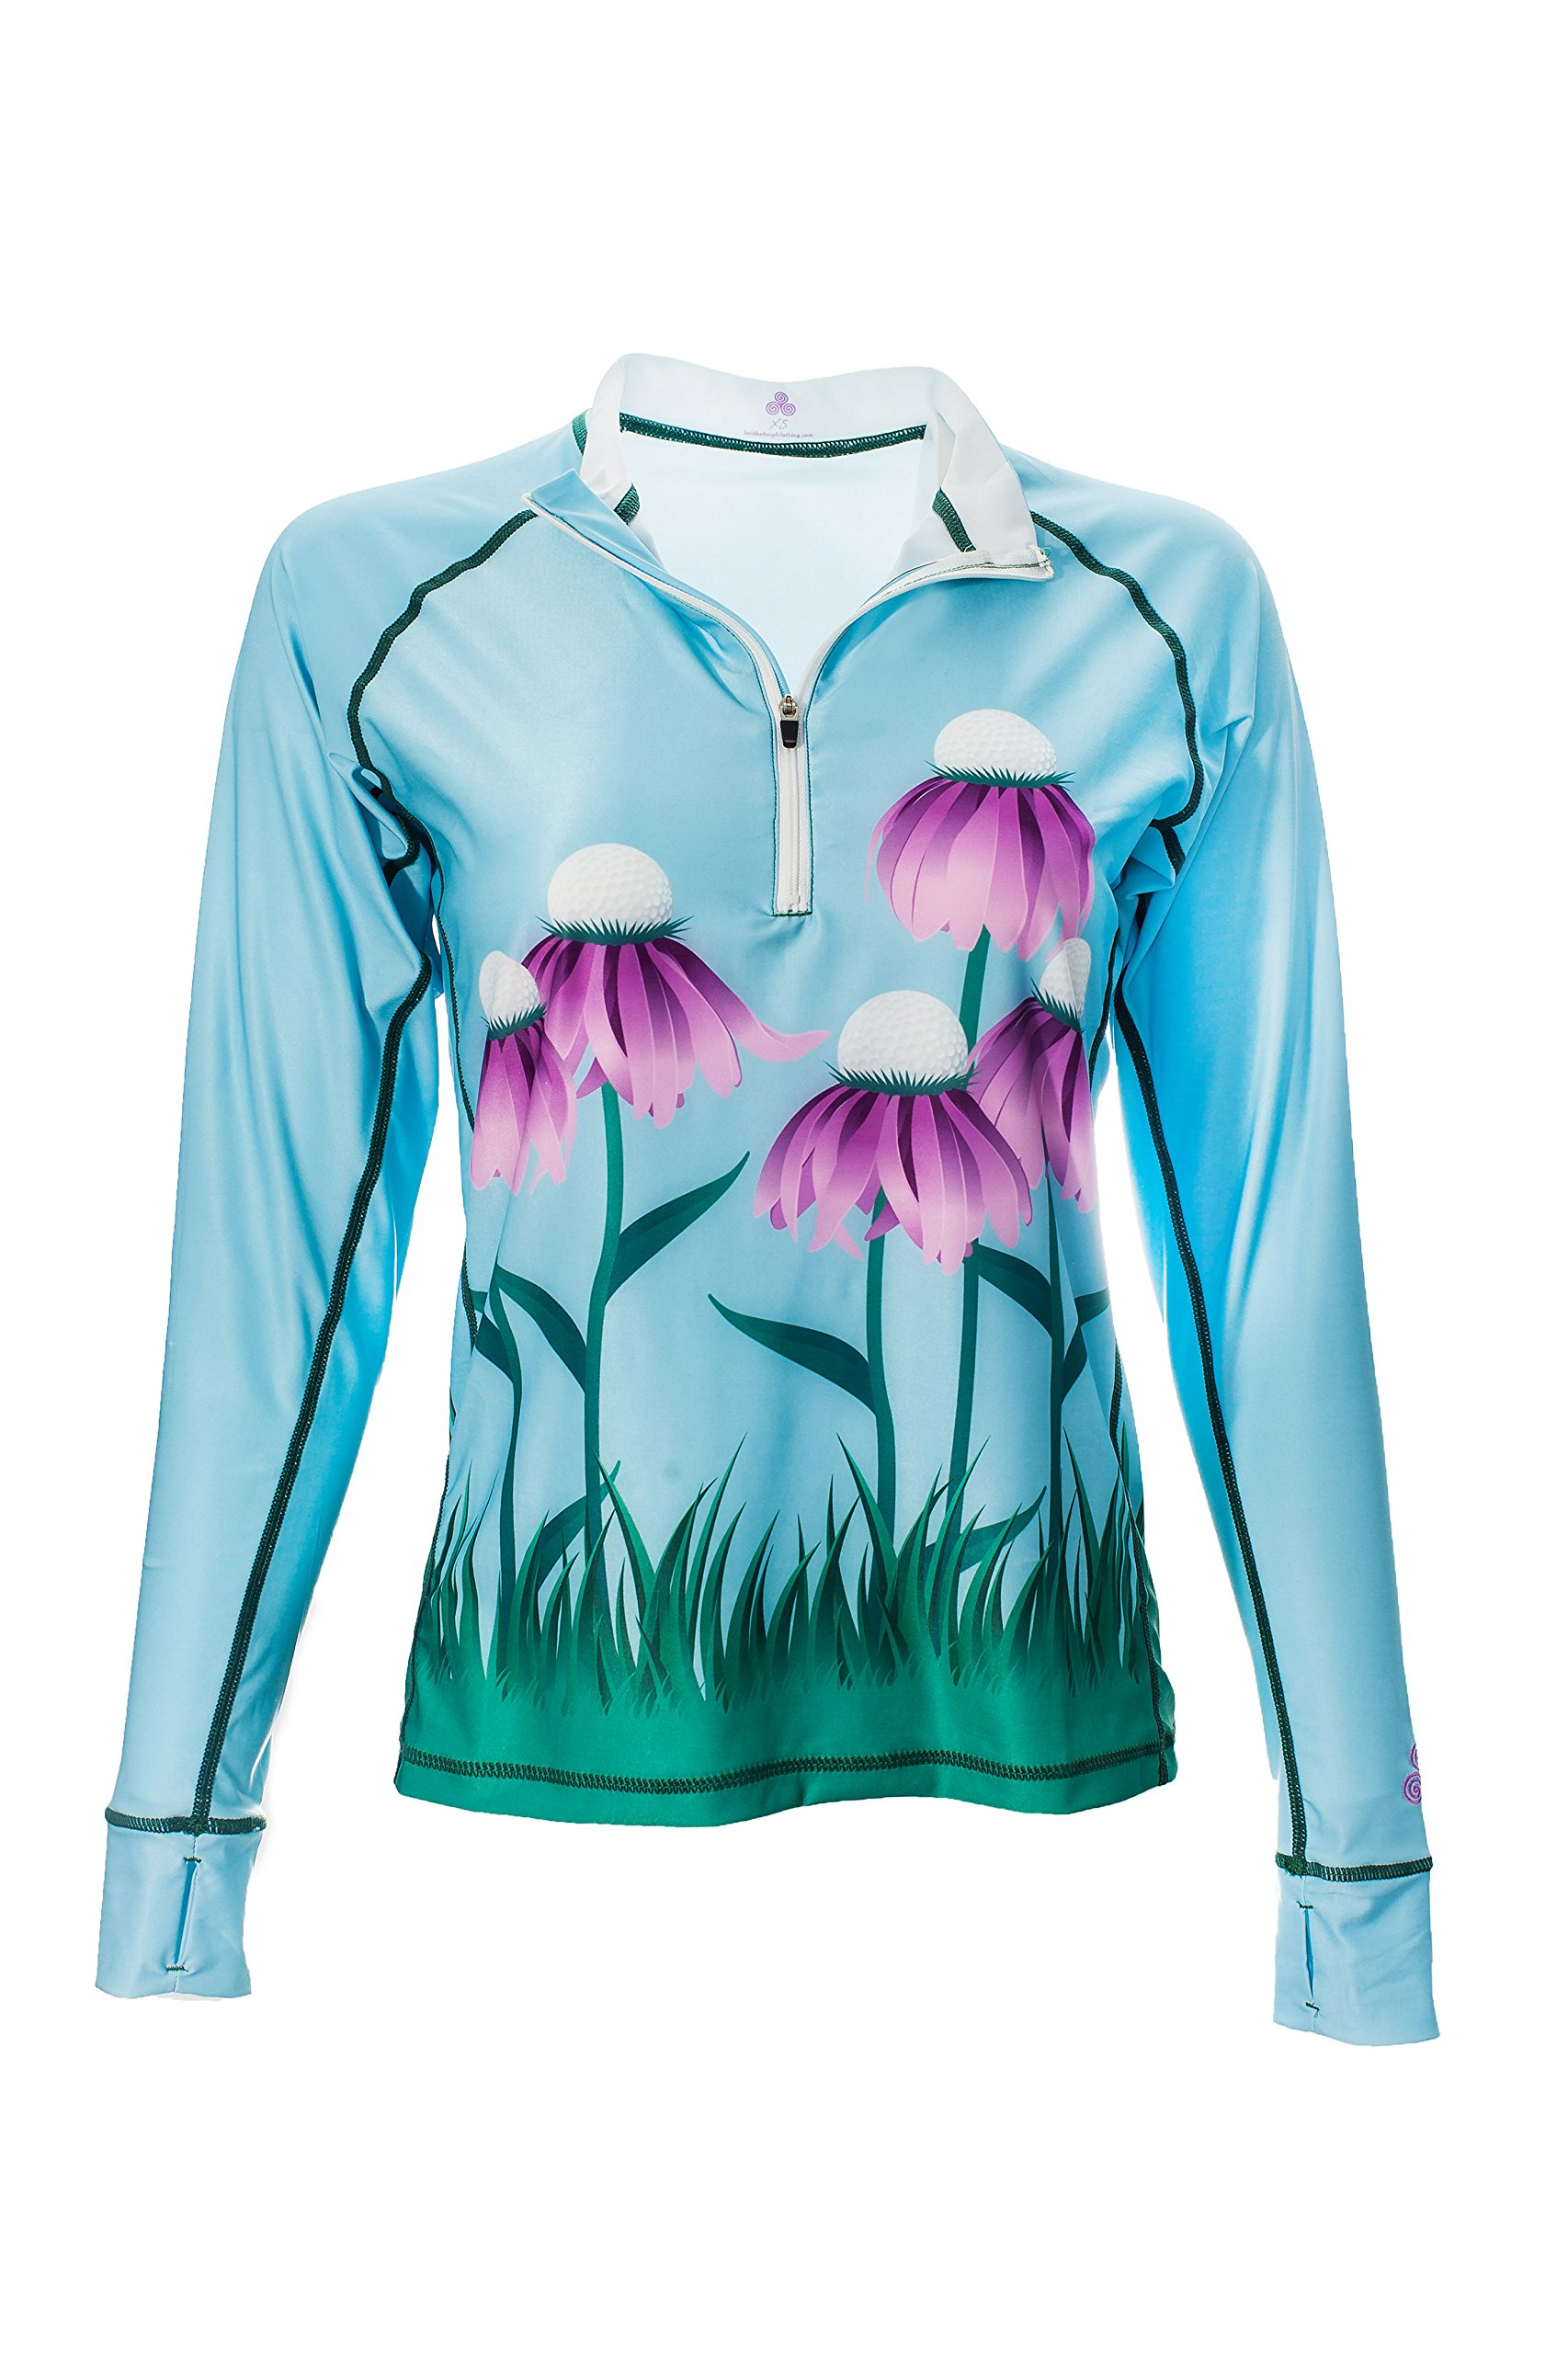 Bold Babe Women's Sun Protective Zip Neck Golf Shirt - SPF Clothing Perfect for Enjoying The Outdoors - Flower Power (Medium)